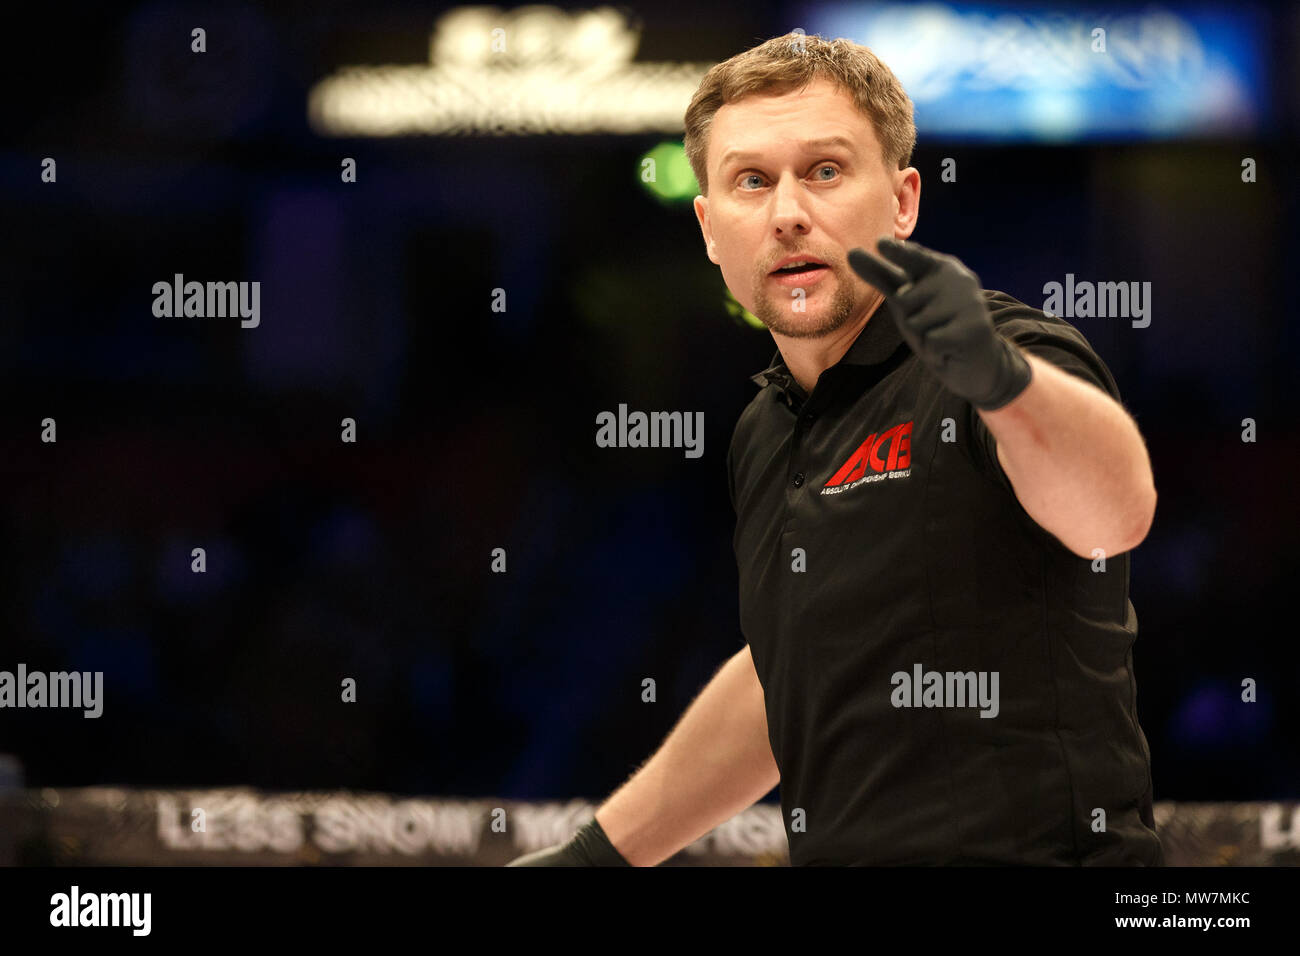 Viktor Korneev, Mixed Martial Arts (MMA) referee. - Stock Image